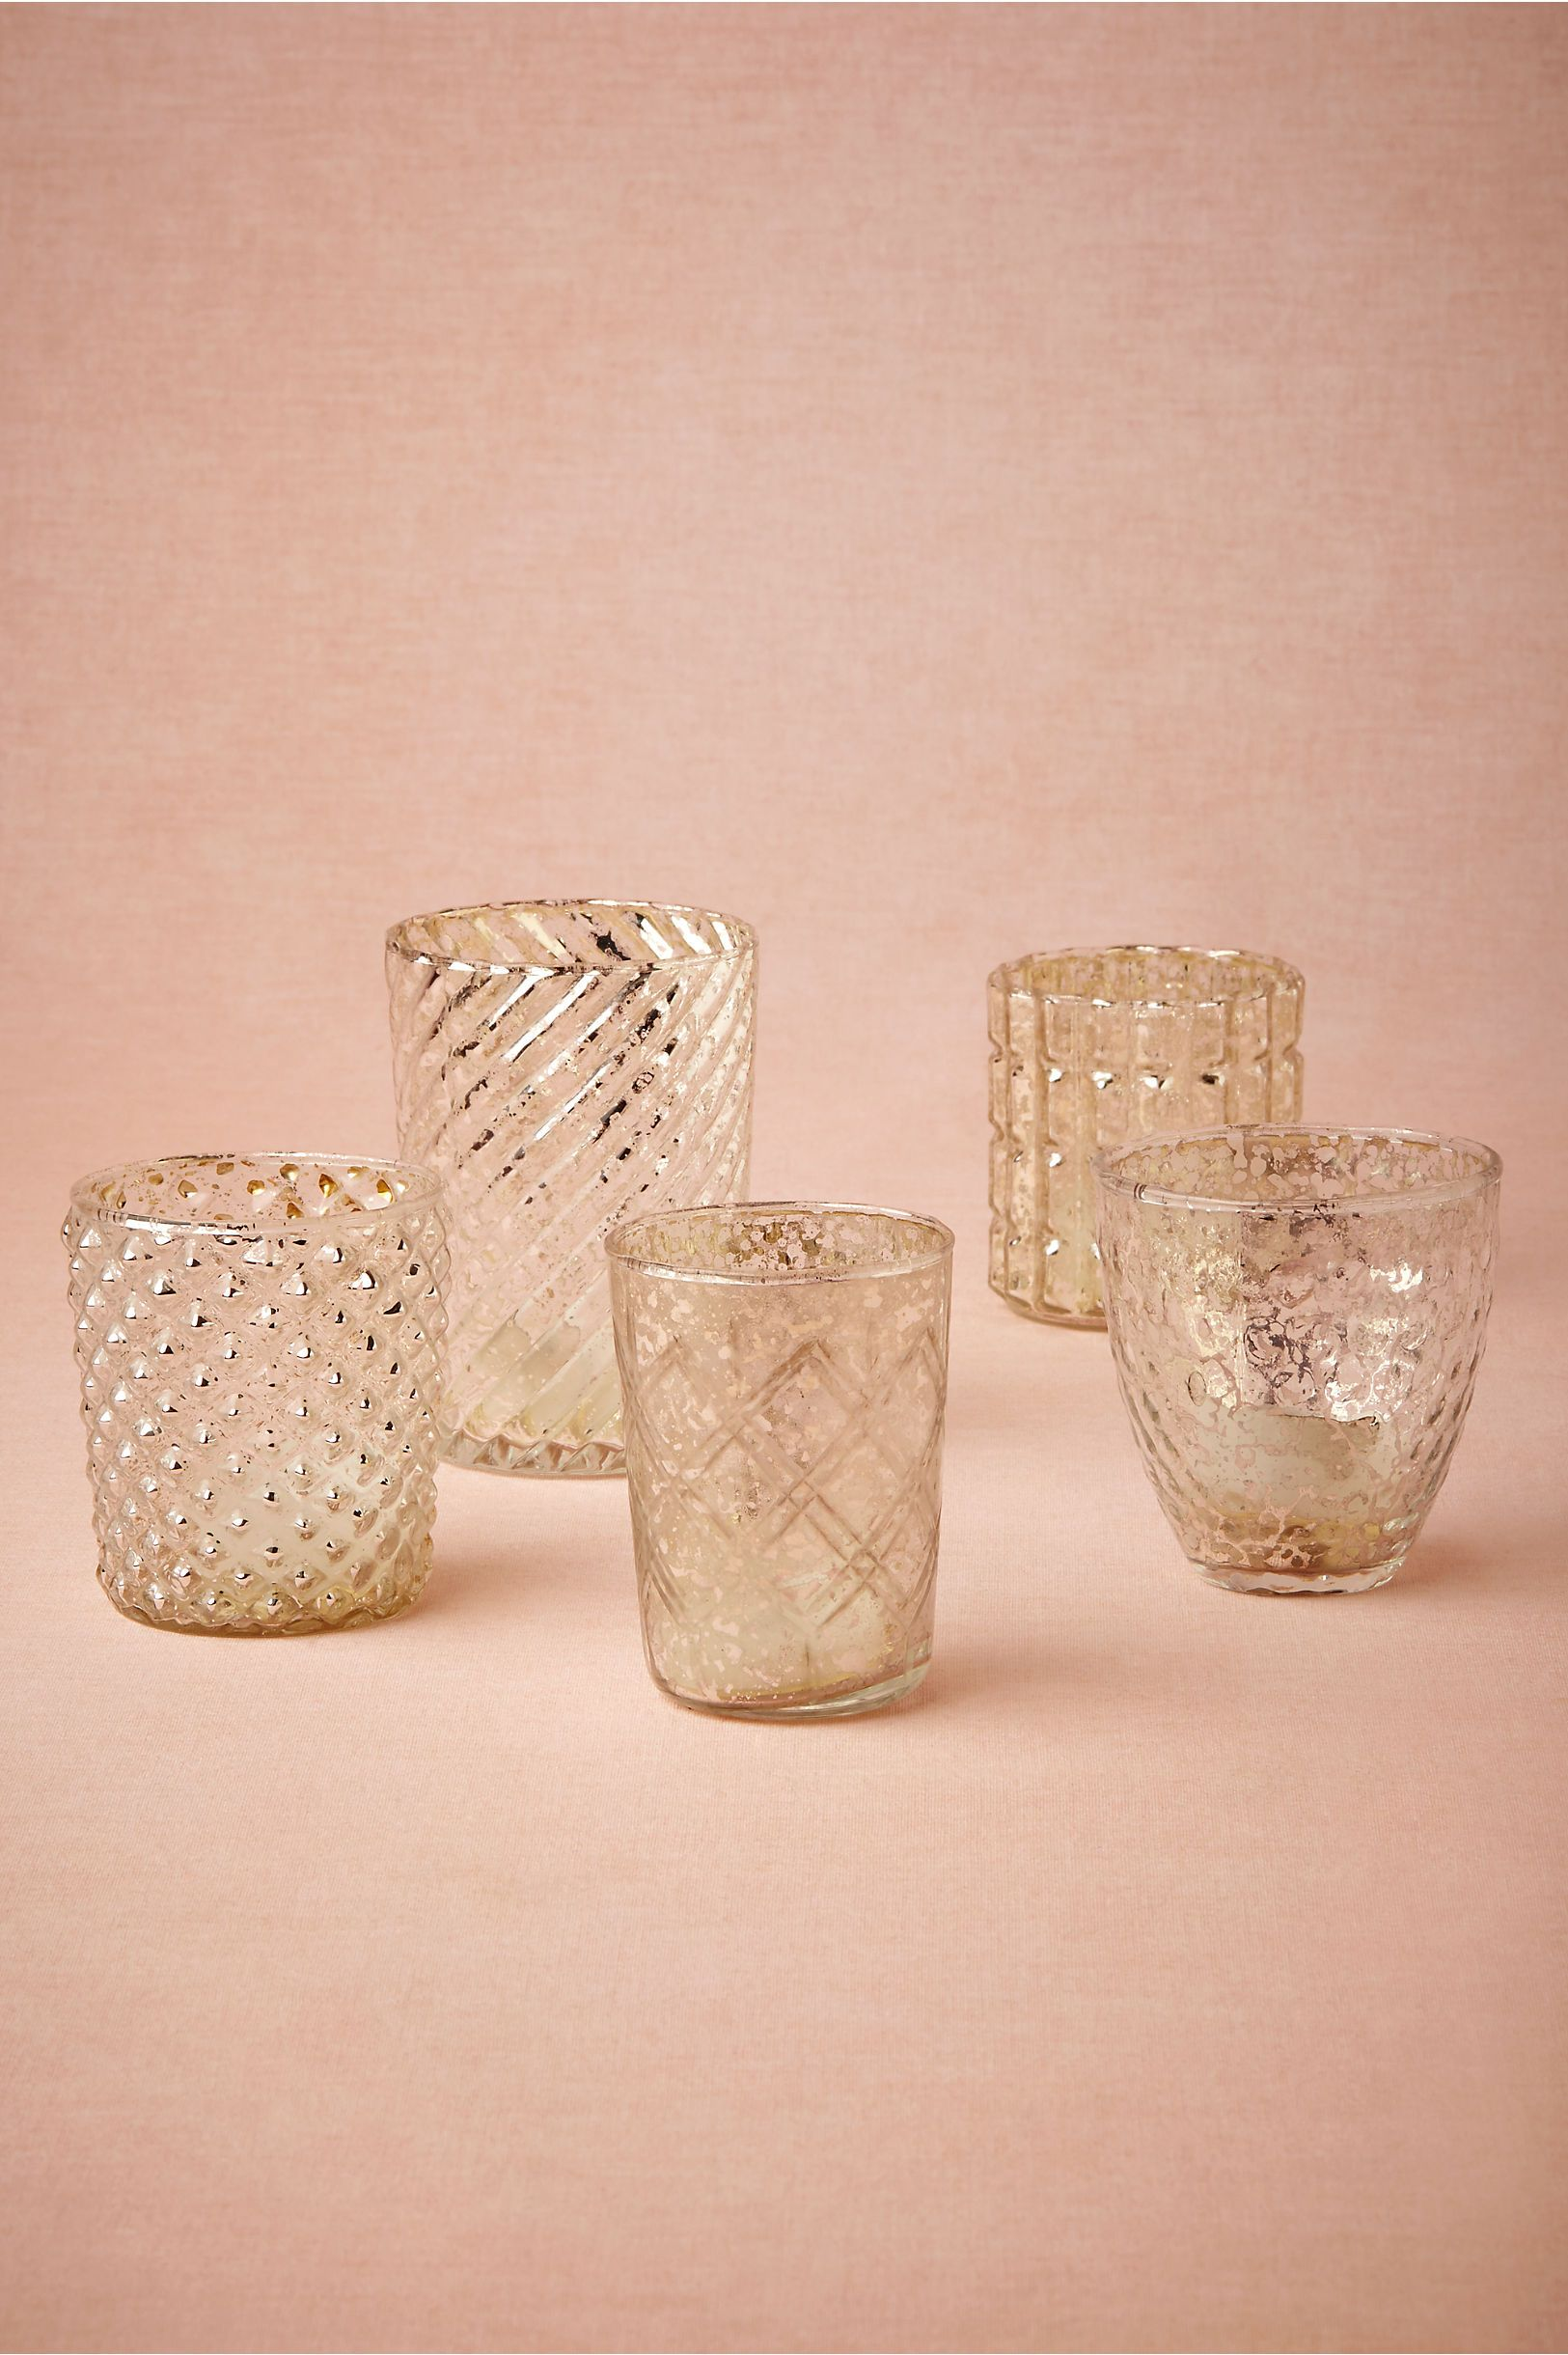 bric a brac silver mercury glass votives from bhldn 30 gift ideas recep o casamento. Black Bedroom Furniture Sets. Home Design Ideas